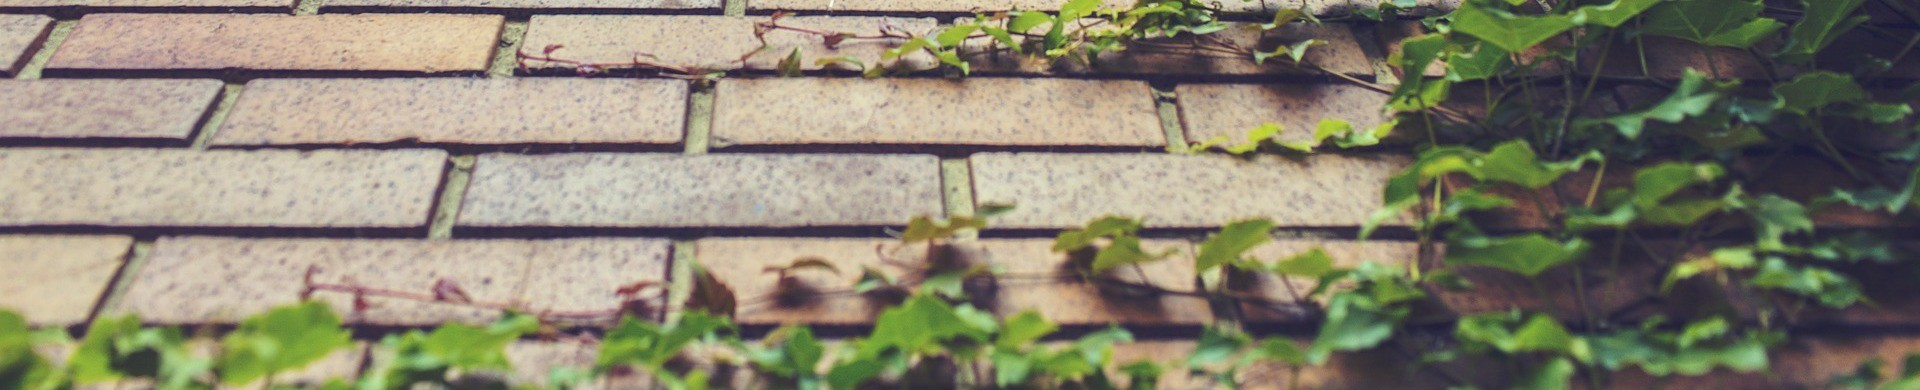 Climbing plants - Buy climbing plants